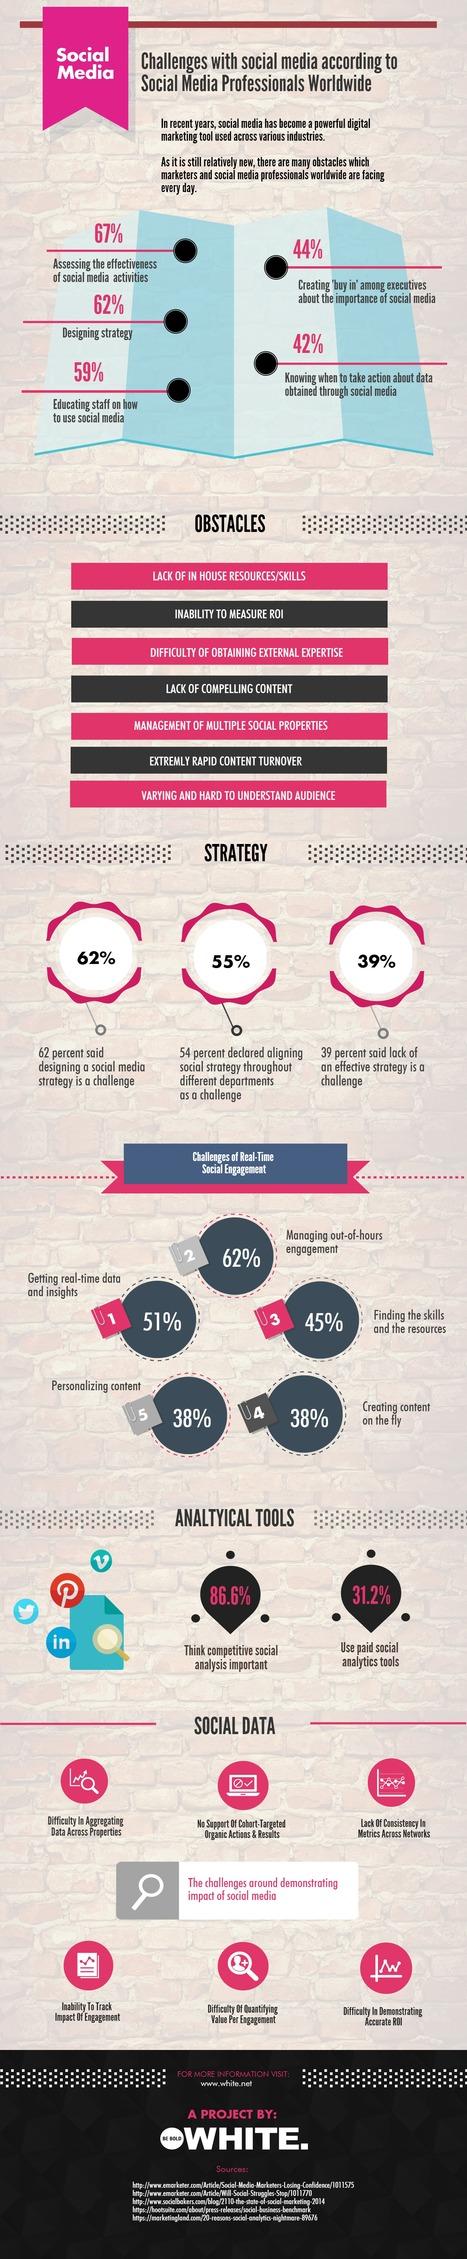 New service to combat social media challenge | Social Media Marketing | Scoop.it